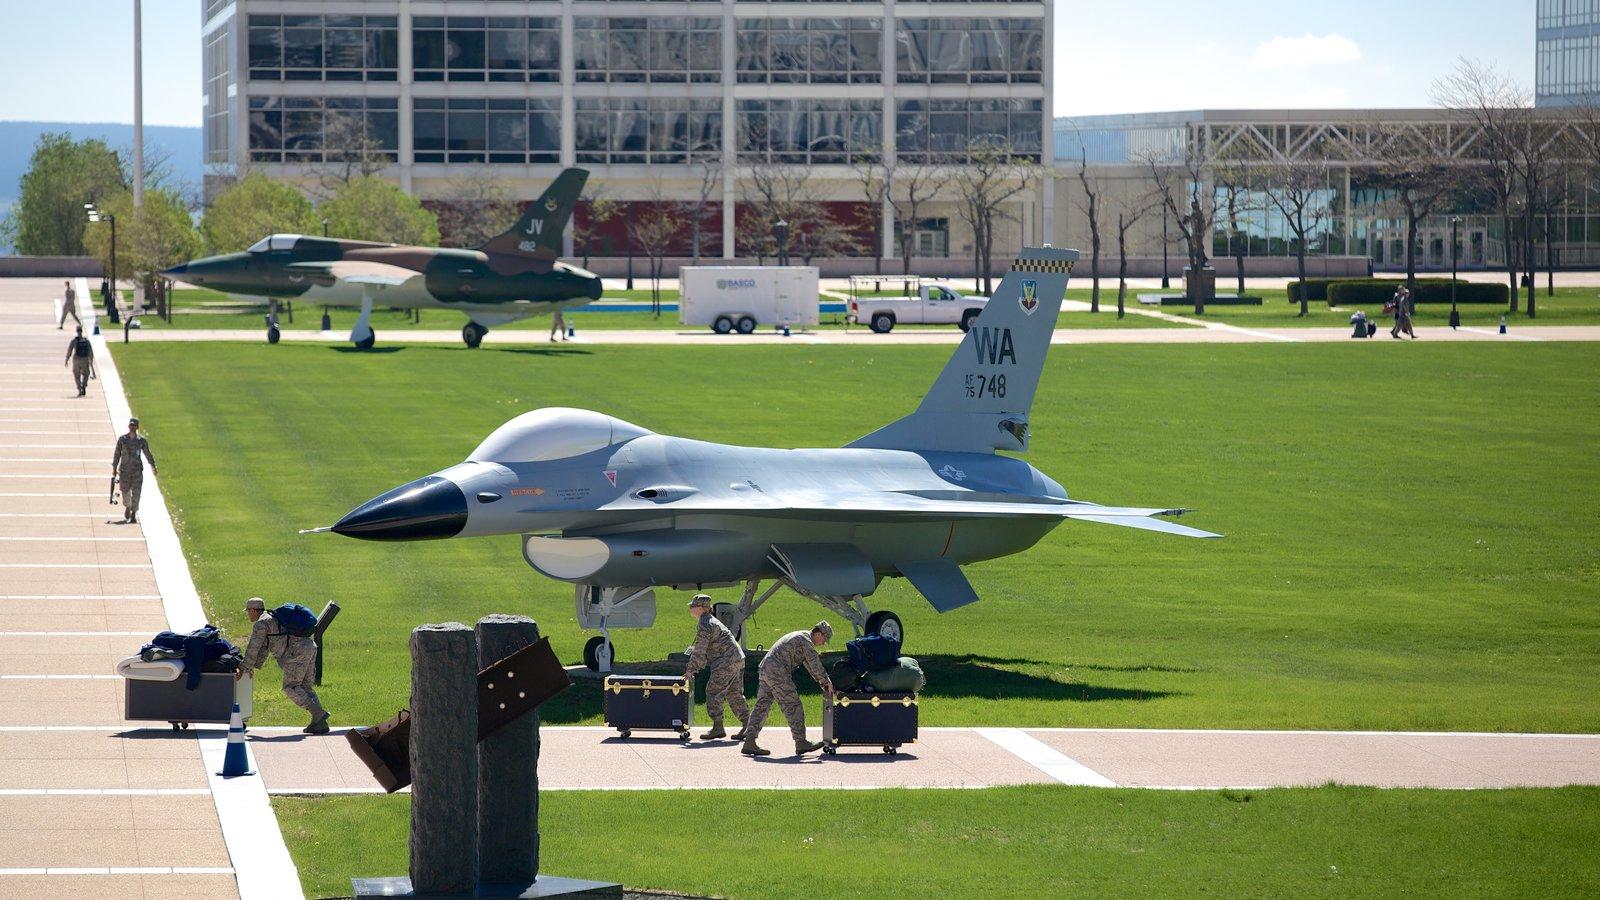 US Air Force Academy caracterizando itens militares e aeronave